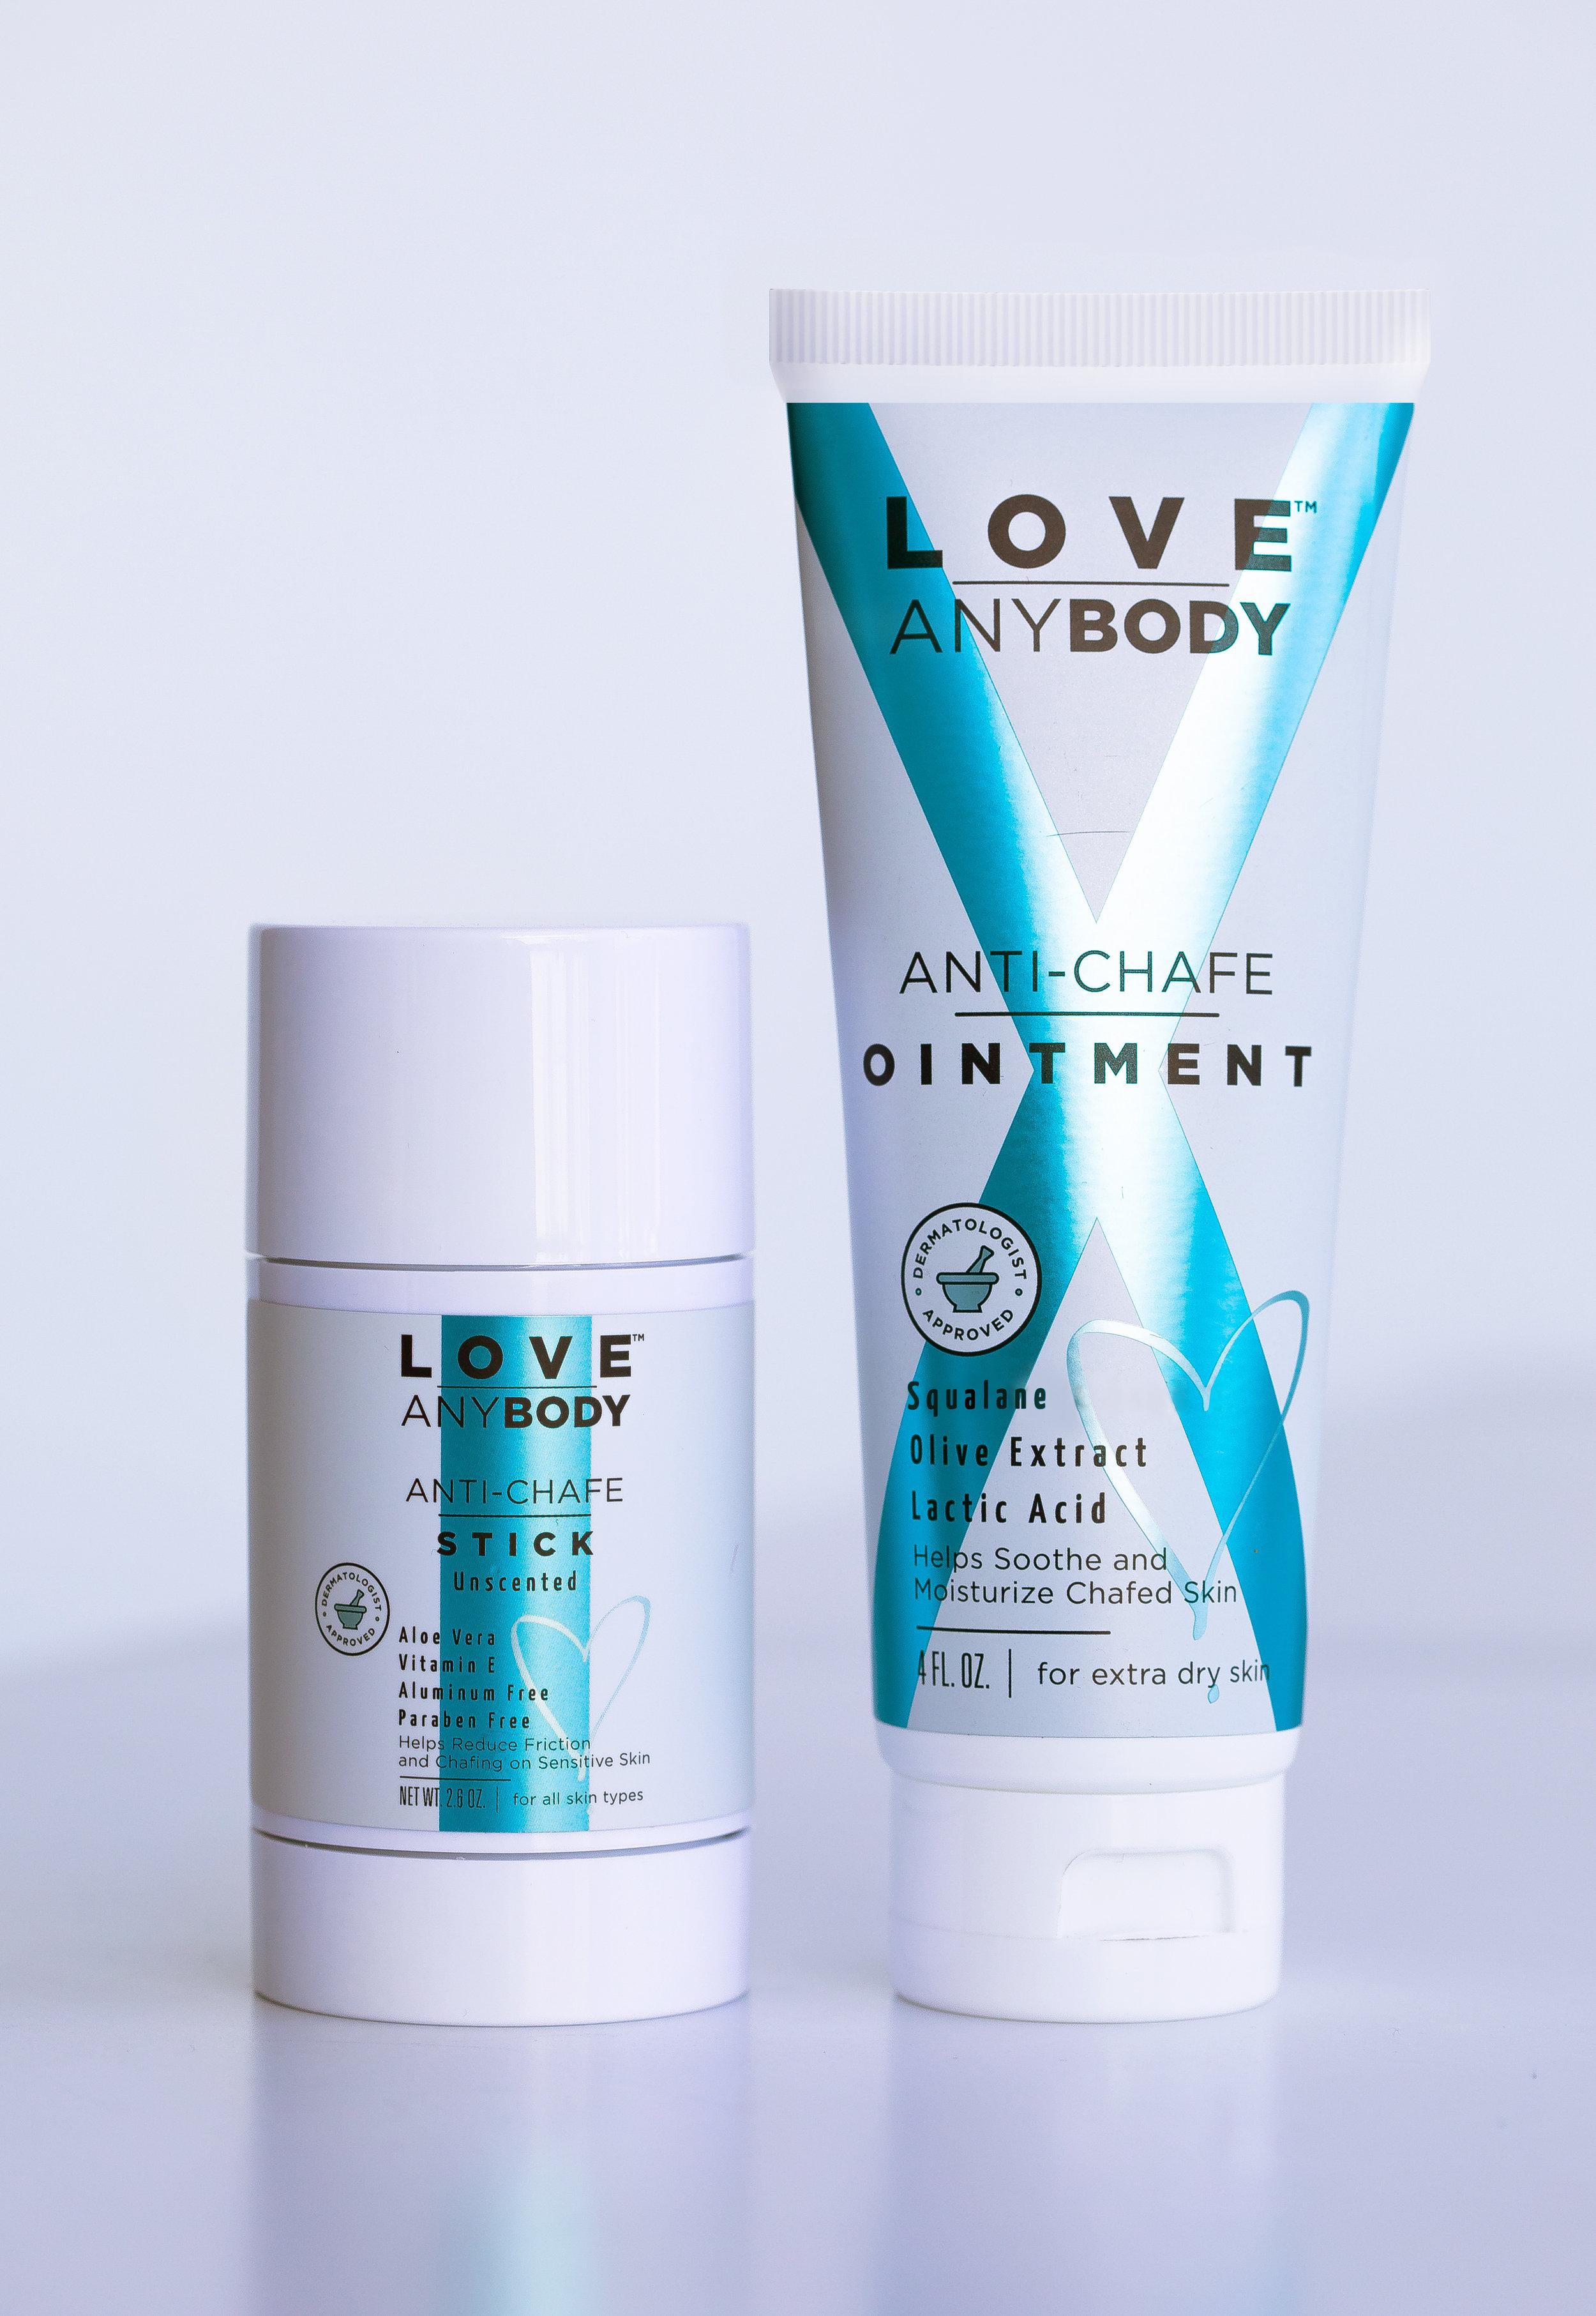 Love AnyBody Anti-Chafe Products.jpg